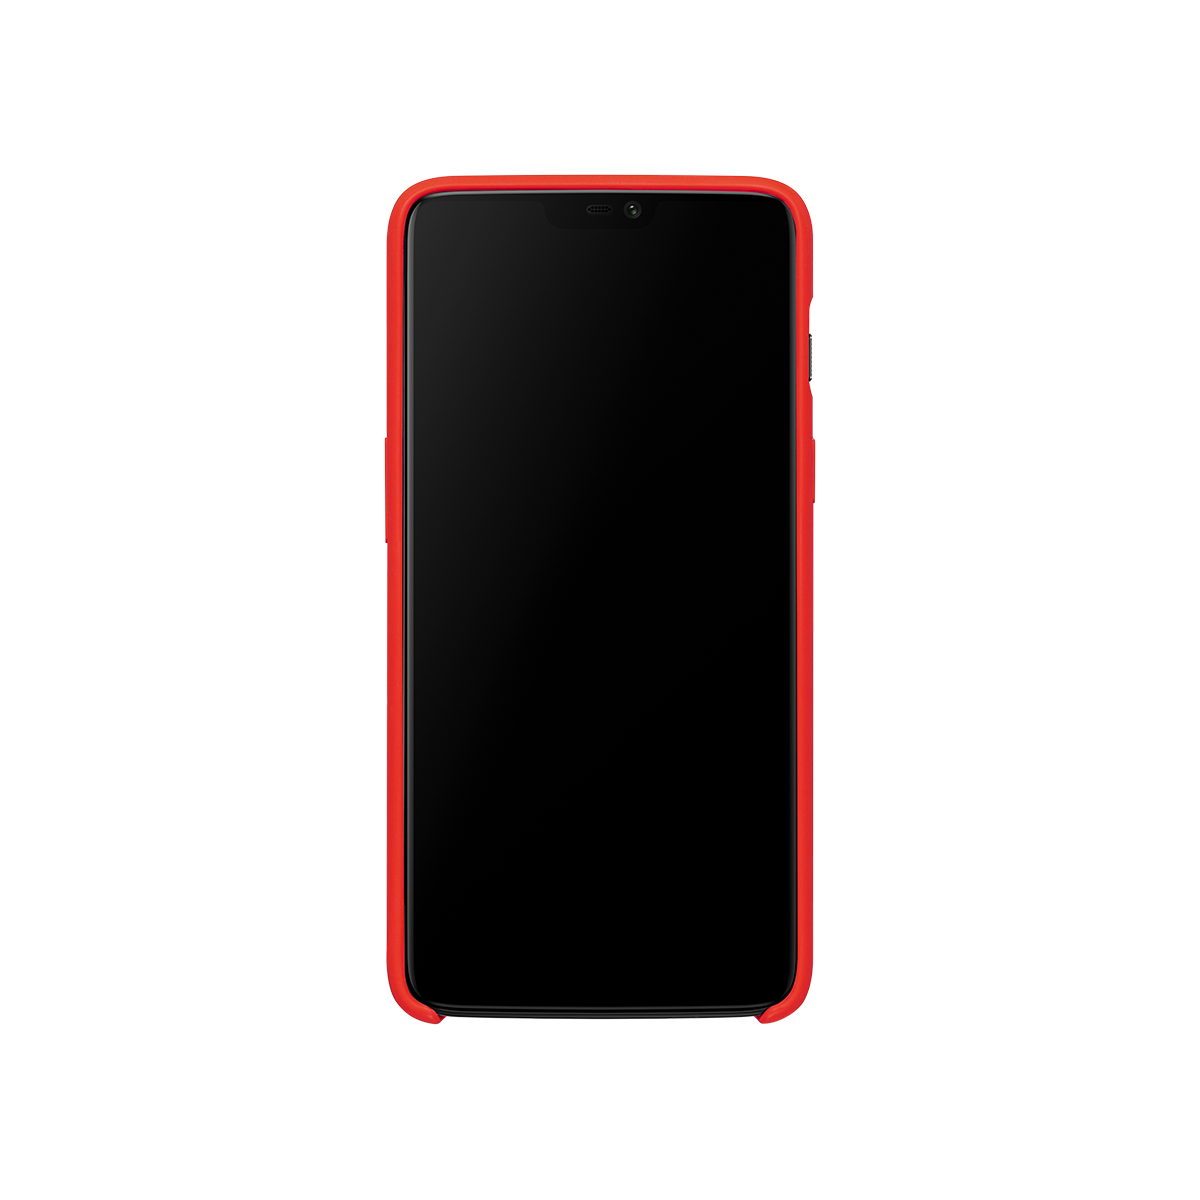 promo code 76b28 a2623 OnePlus 6 Silicone Protective Case - OnePlus (United Kingdom)